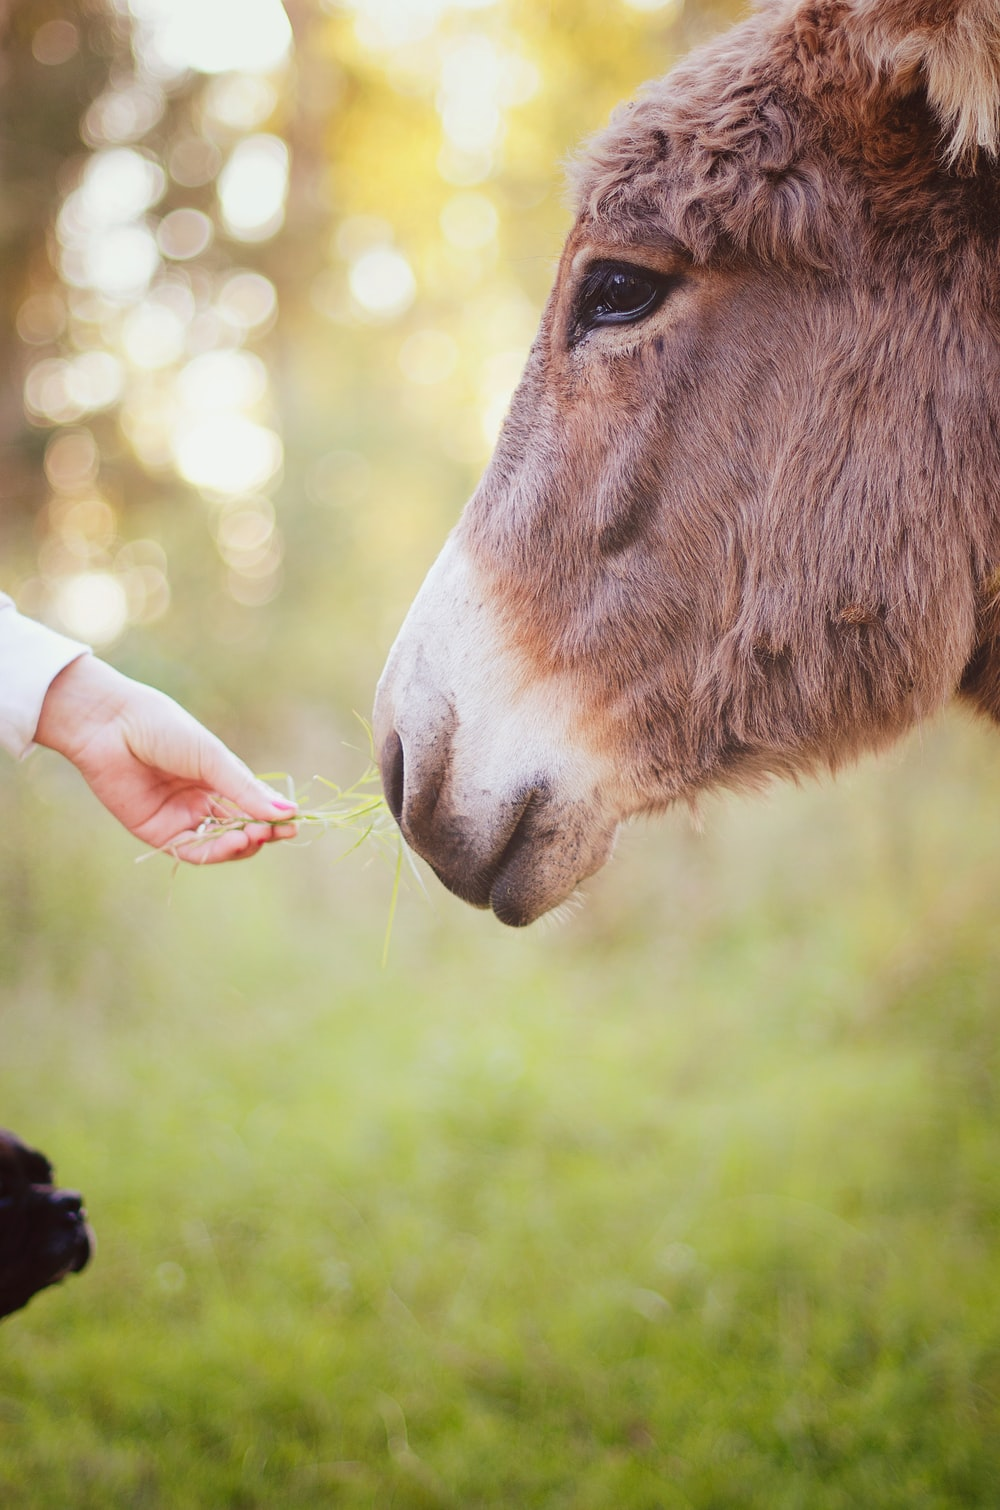 person holding green grass feeding brown animal